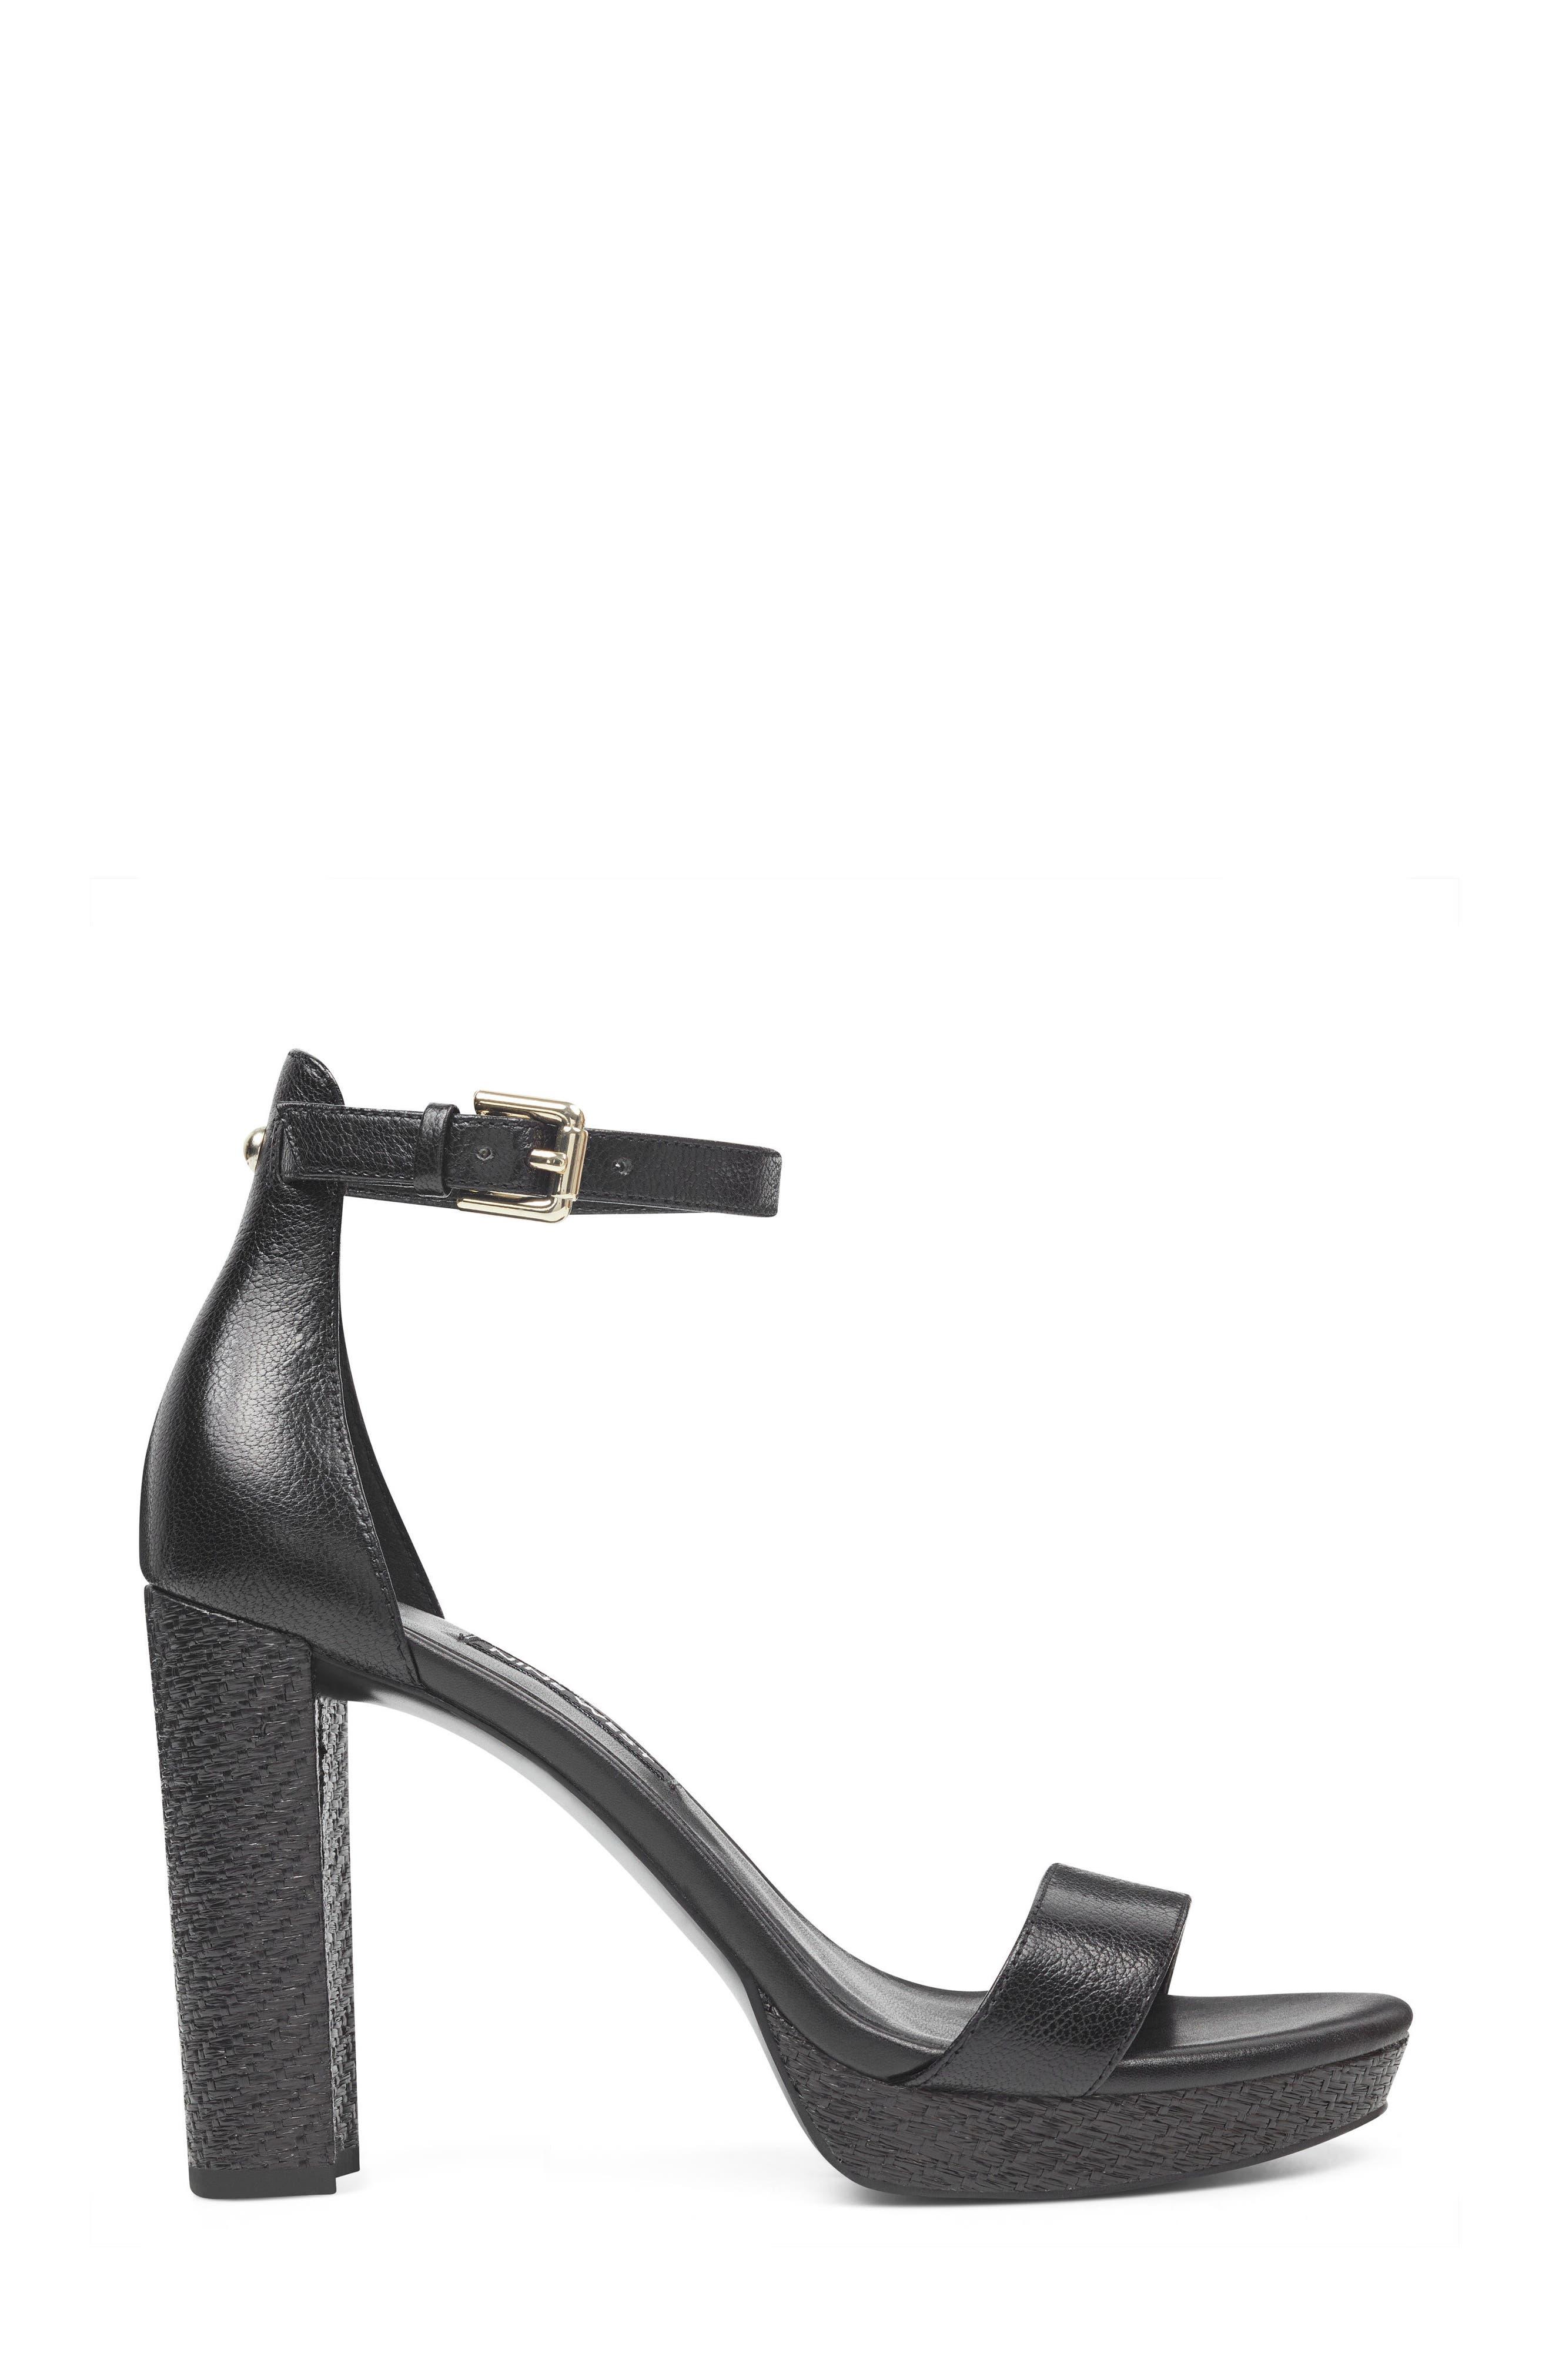 Dempsey Platform Sandal,                             Alternate thumbnail 3, color,                             Black